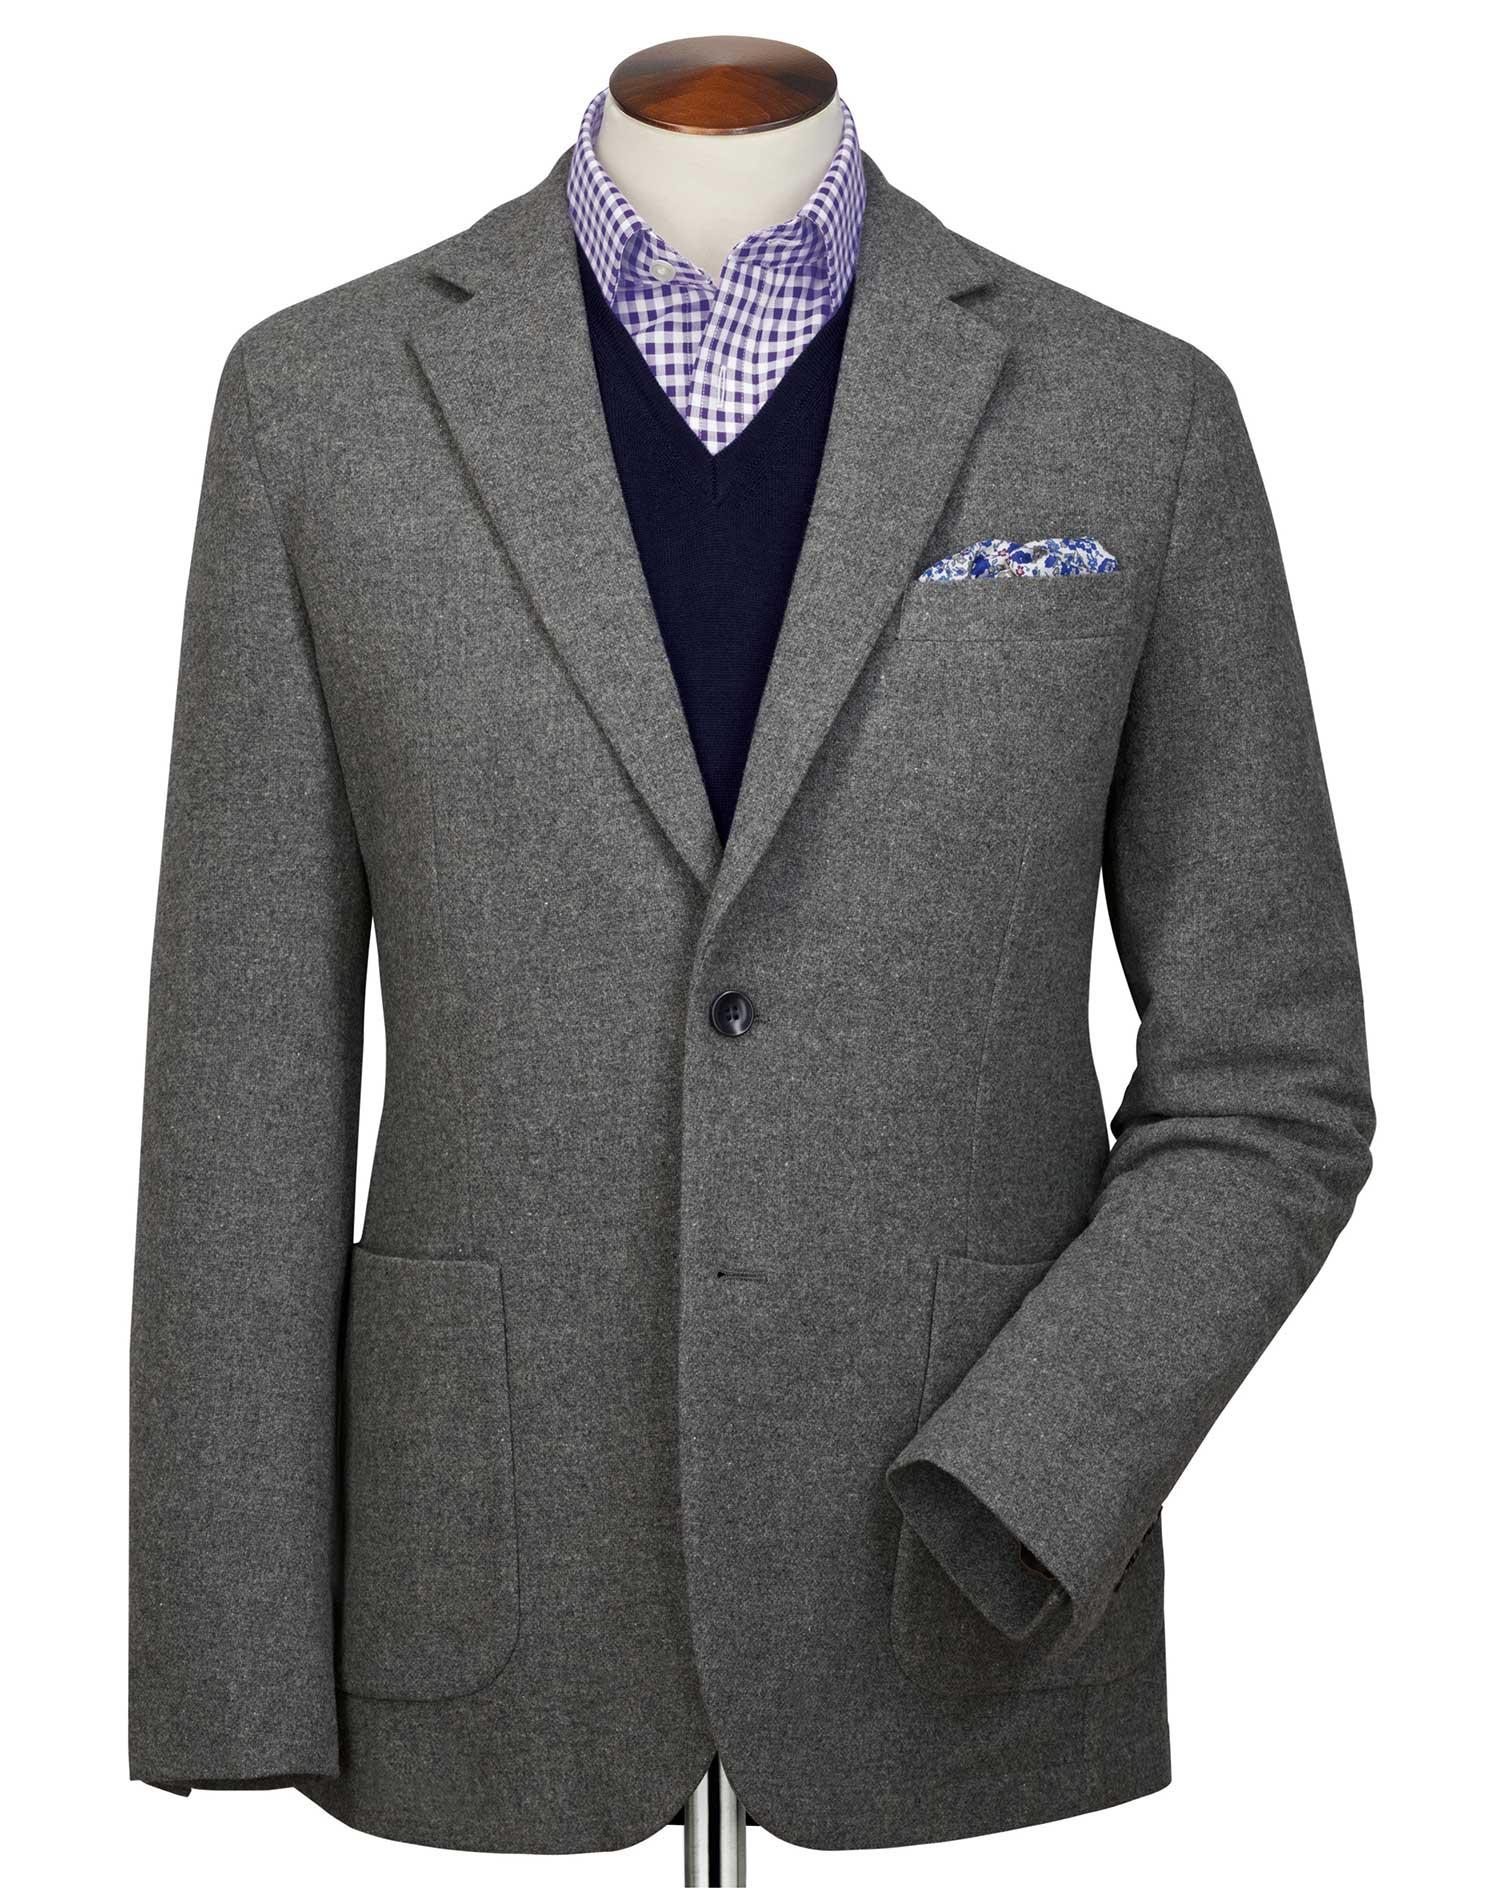 Slim Fit Grey Plain Wool Flannel Wool Blazer Size 44 Regular by Charles Tyrwhitt